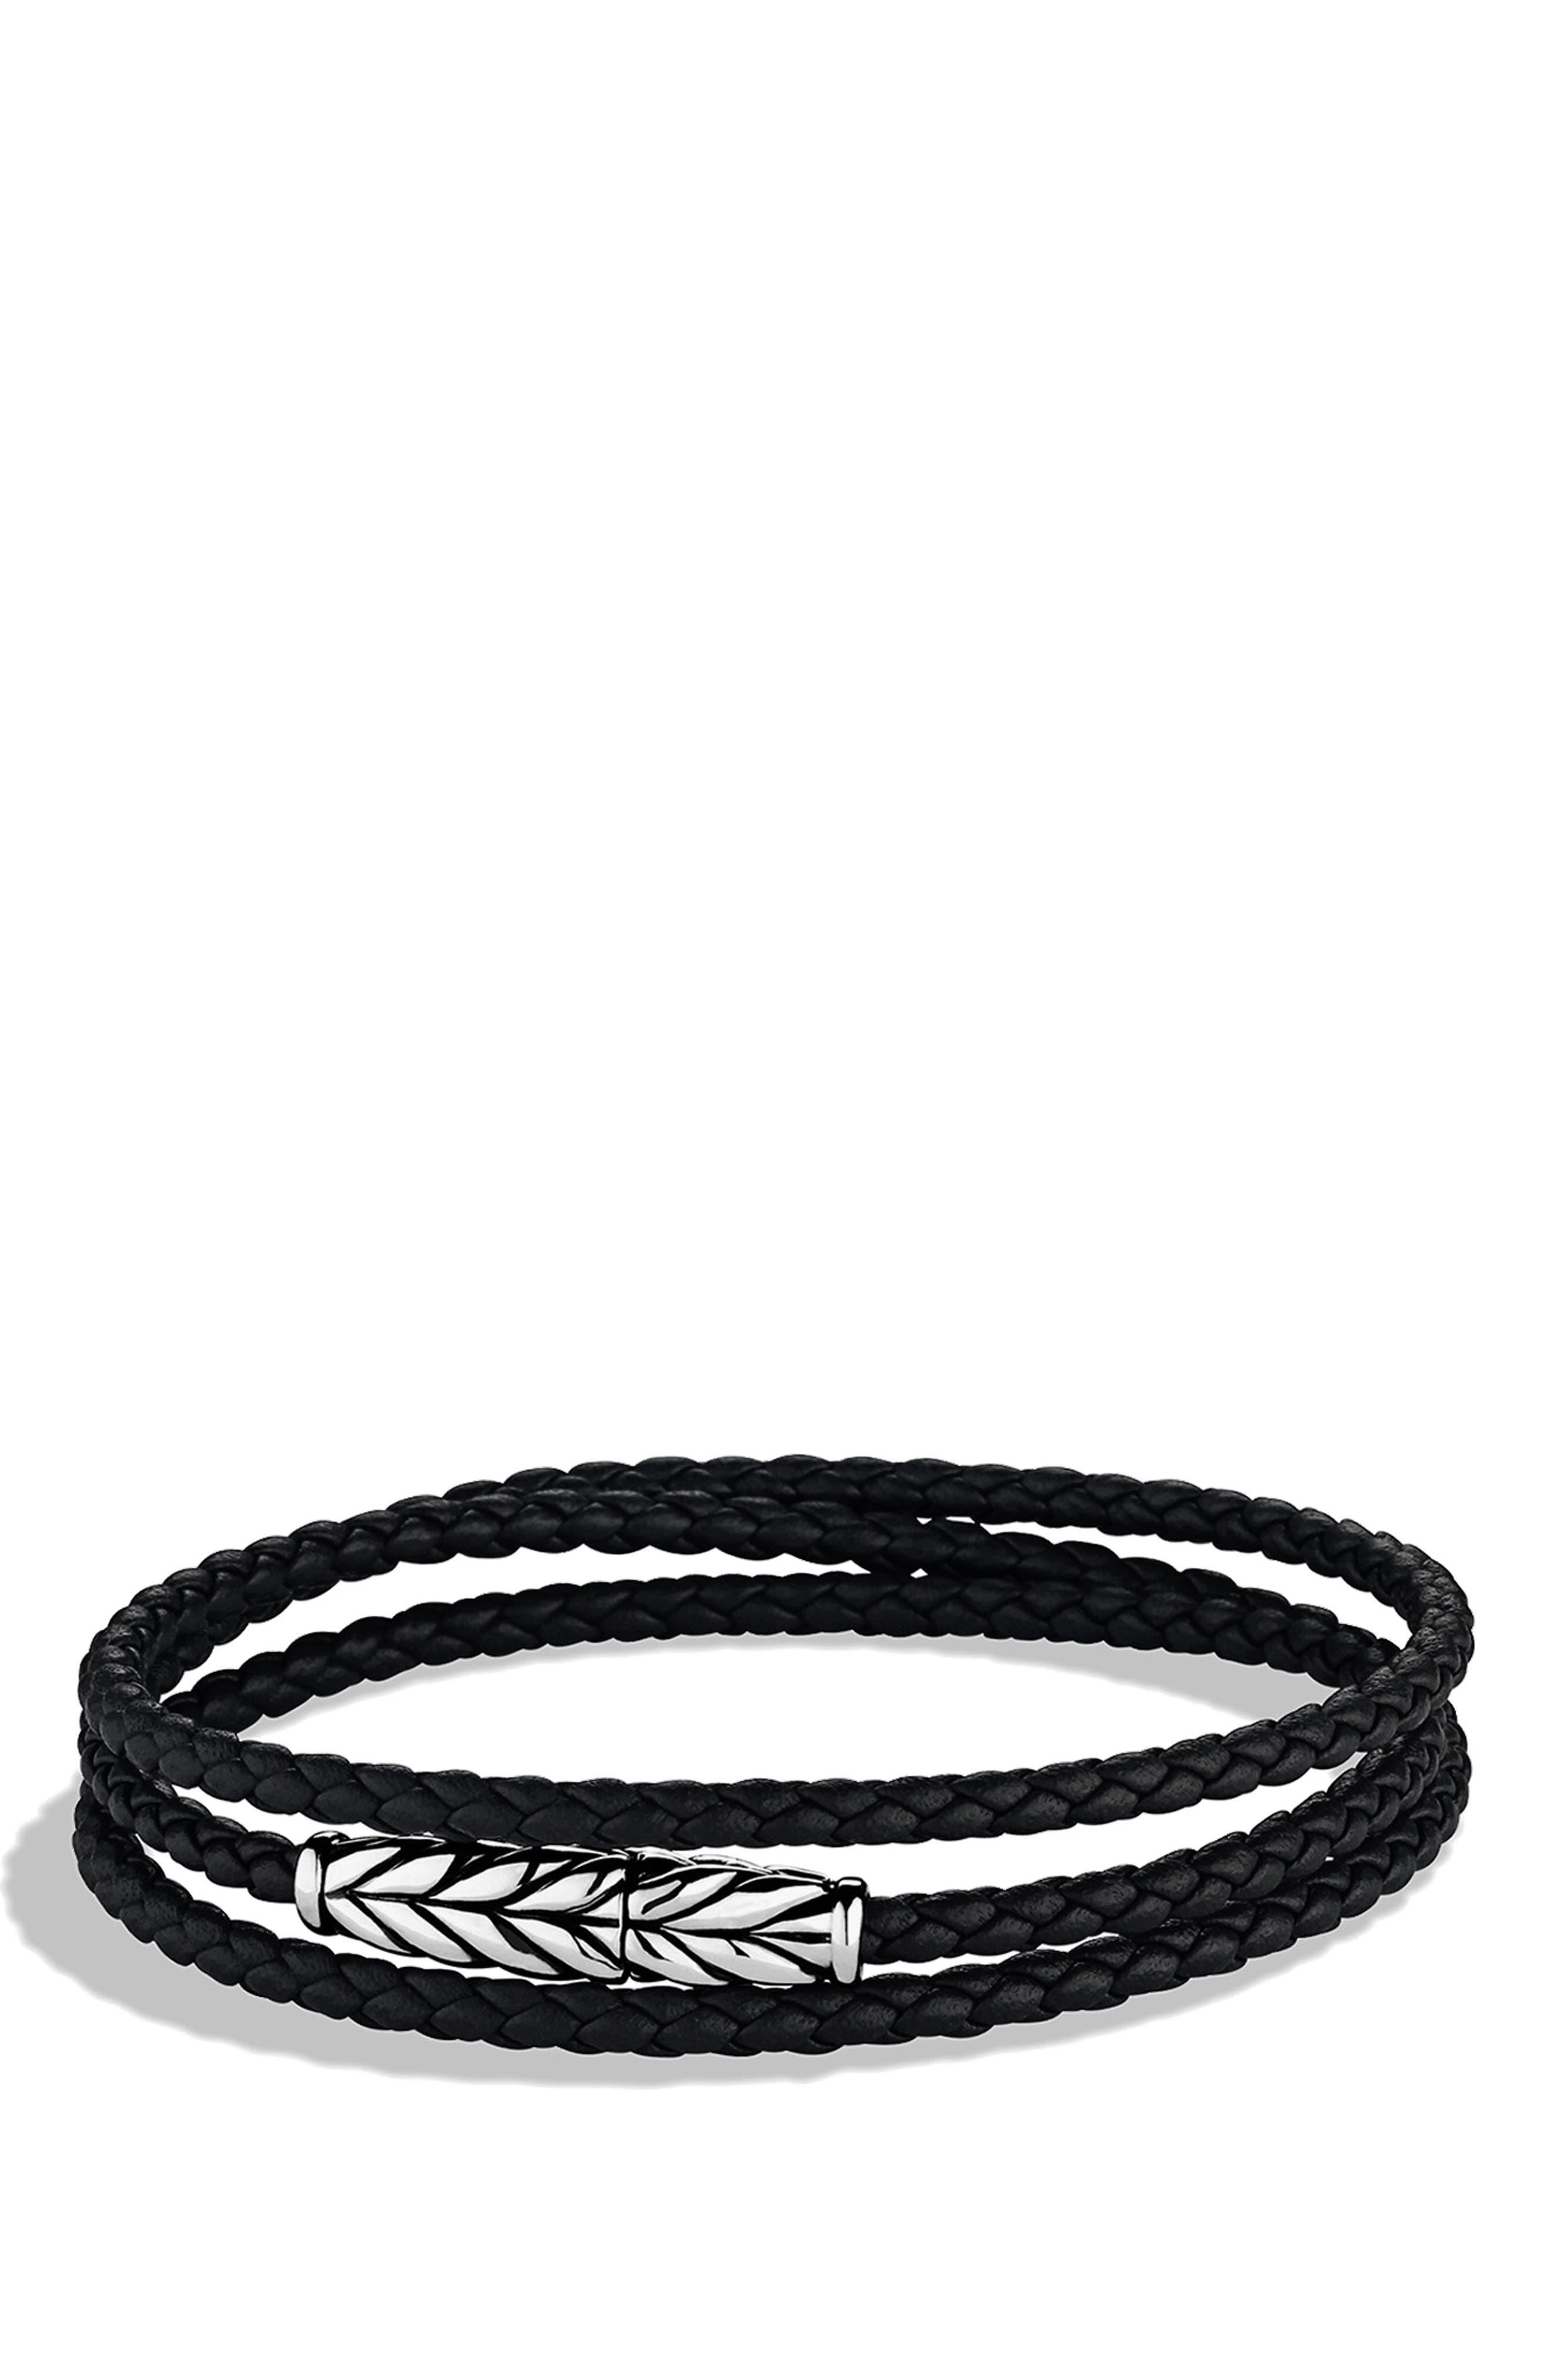 DAVID YURMAN, 'Chevron' Triple-Wrap Bracelet, Main thumbnail 1, color, BLACK LEATHER